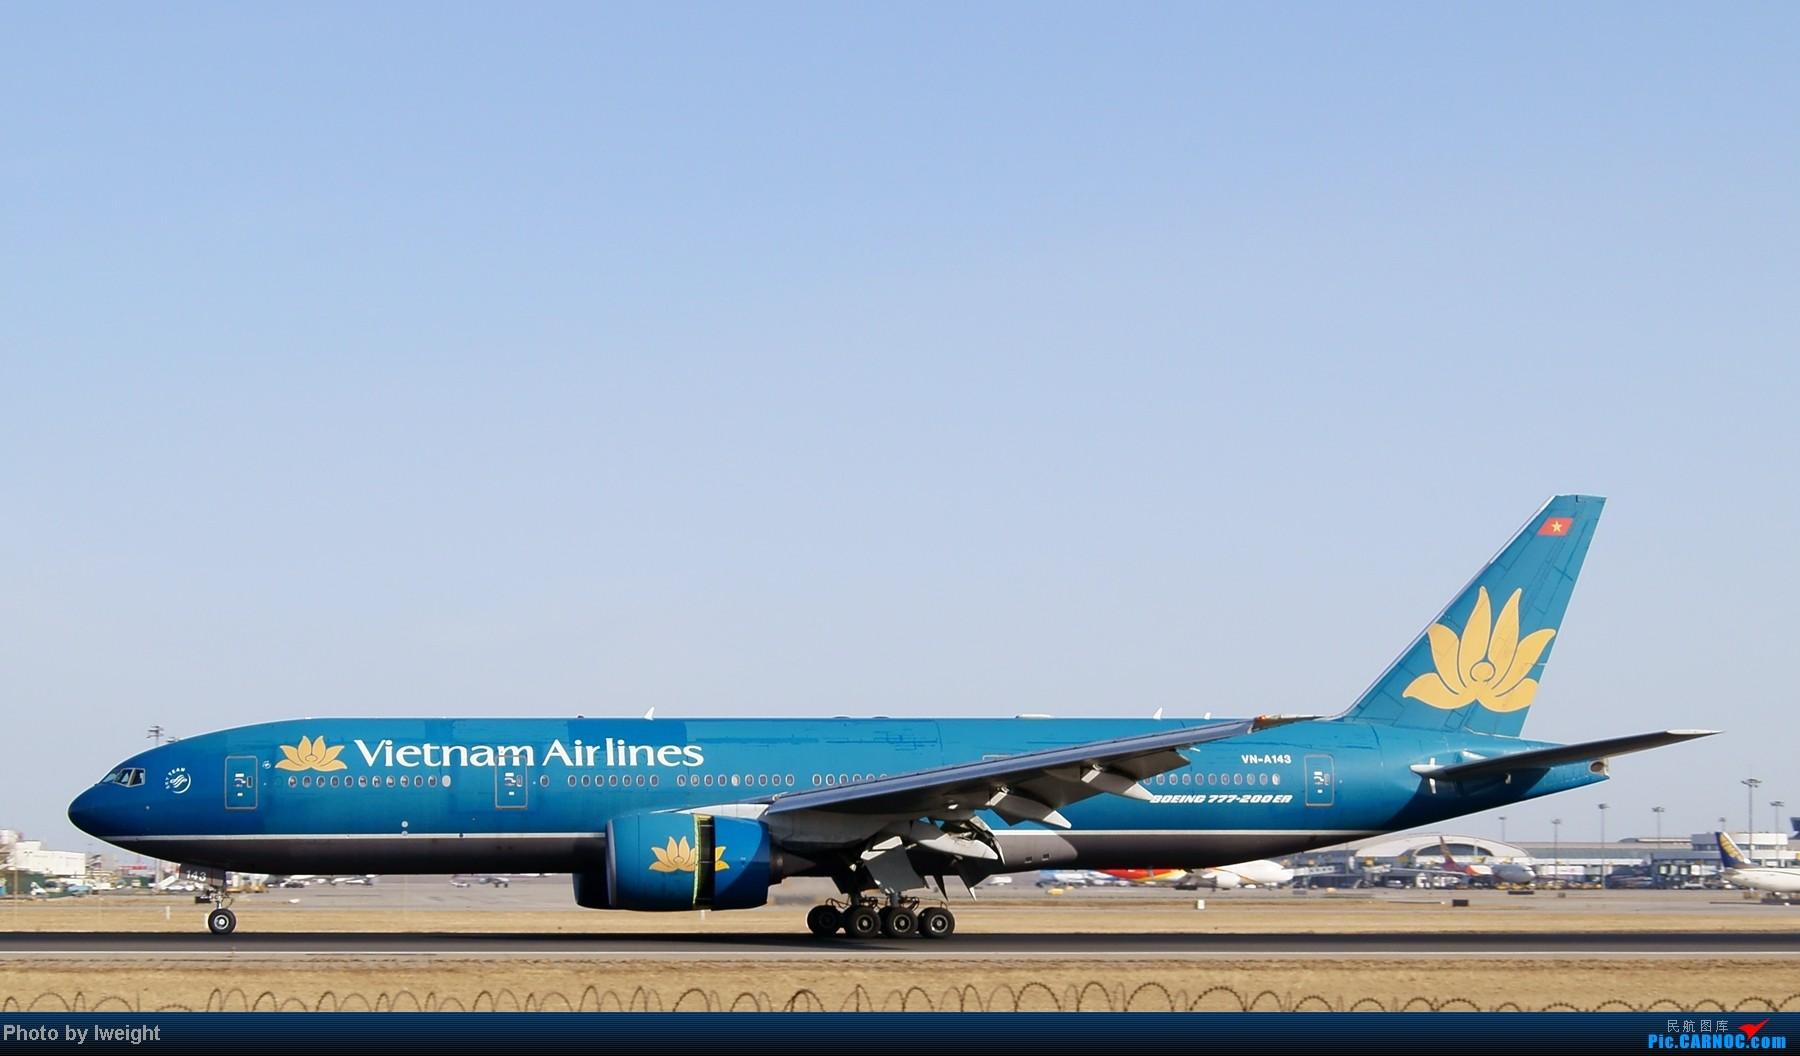 Re:[原创]春节期间首都机场拍机汇报 BOEING 777-200 VN-A143 中国北京首都机场